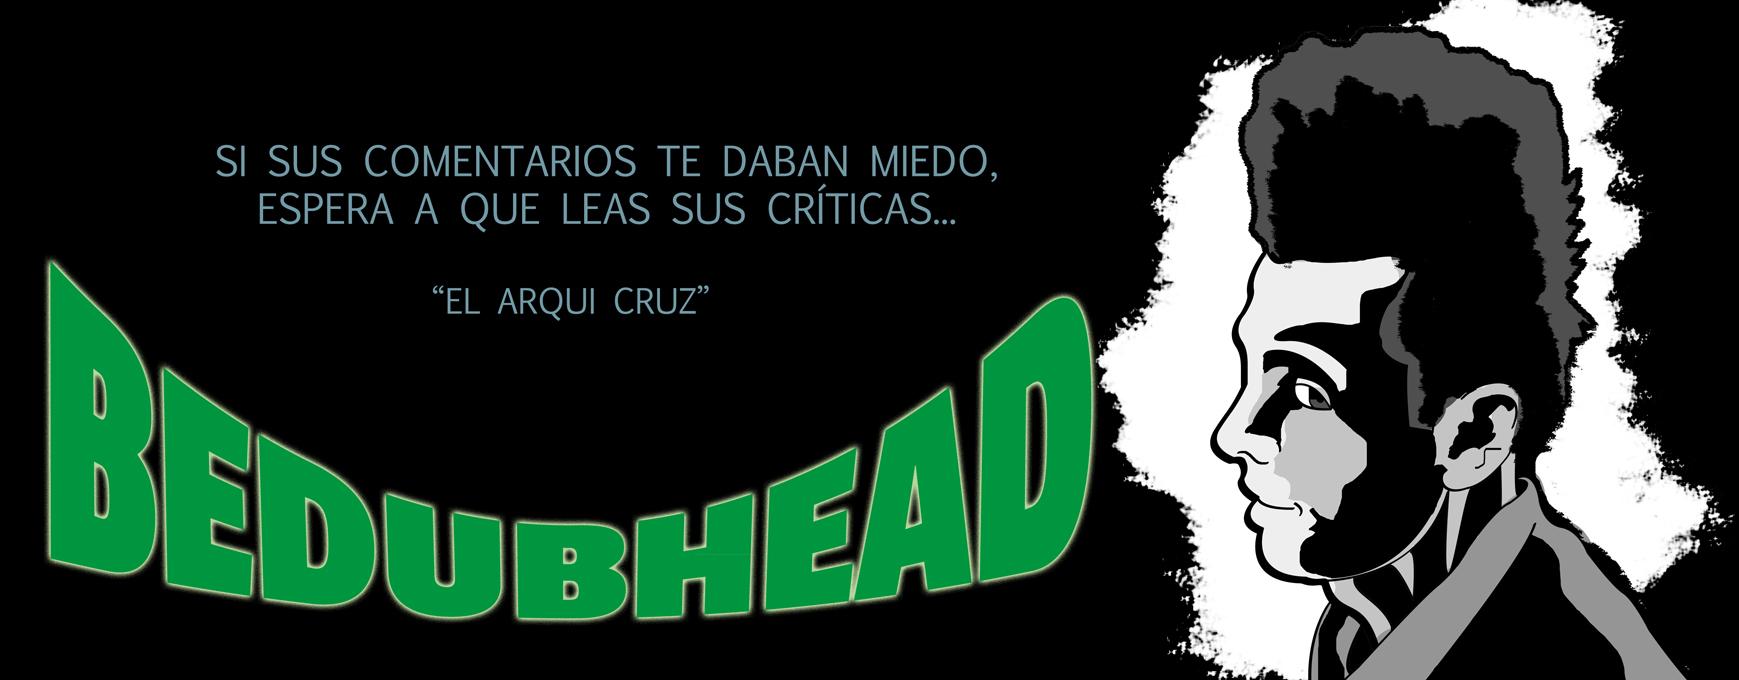 Bedub head BANNER (1)